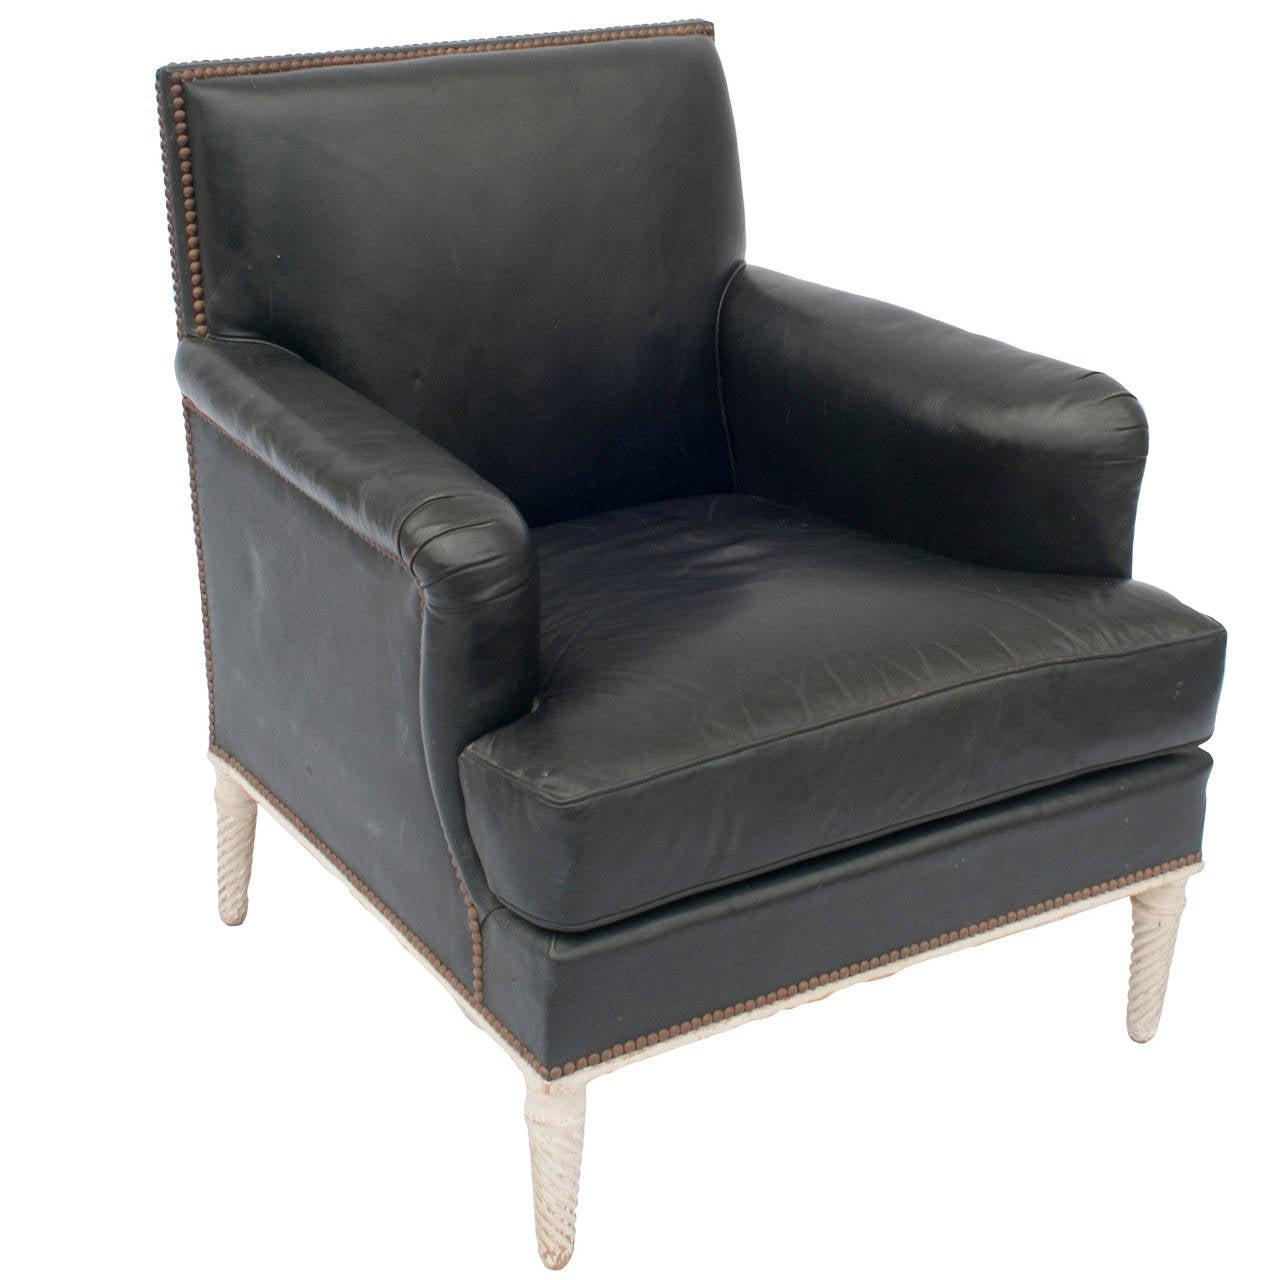 Black leather club chair nailhead - Black Leather Club Chair With Nailhead Trim With Carved Wood Legs 1